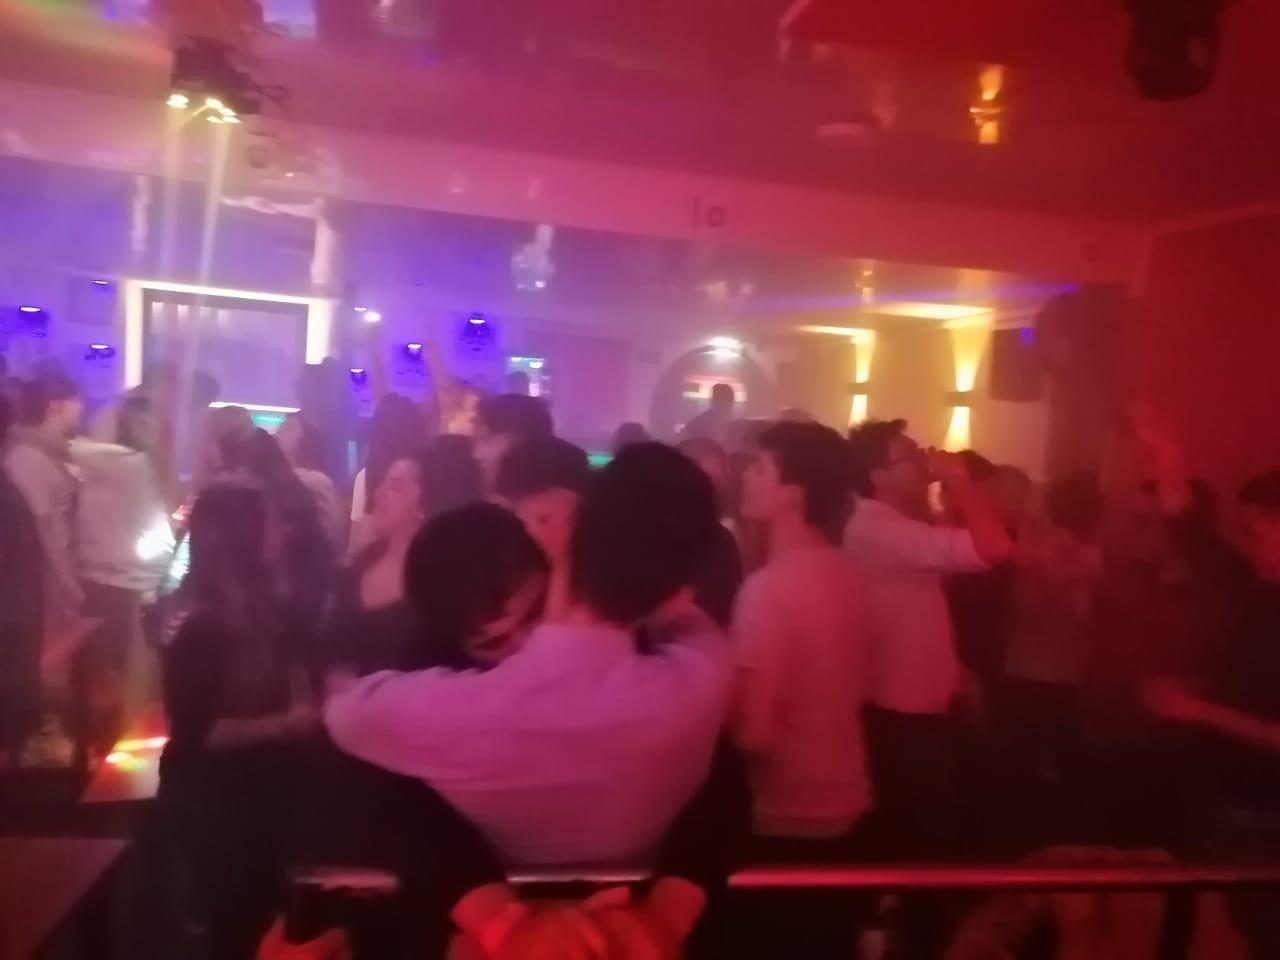 guia gay colombia - dicotecas gay tunja, bares tunja. lesbianas, bisexuales trans de rumba (8)